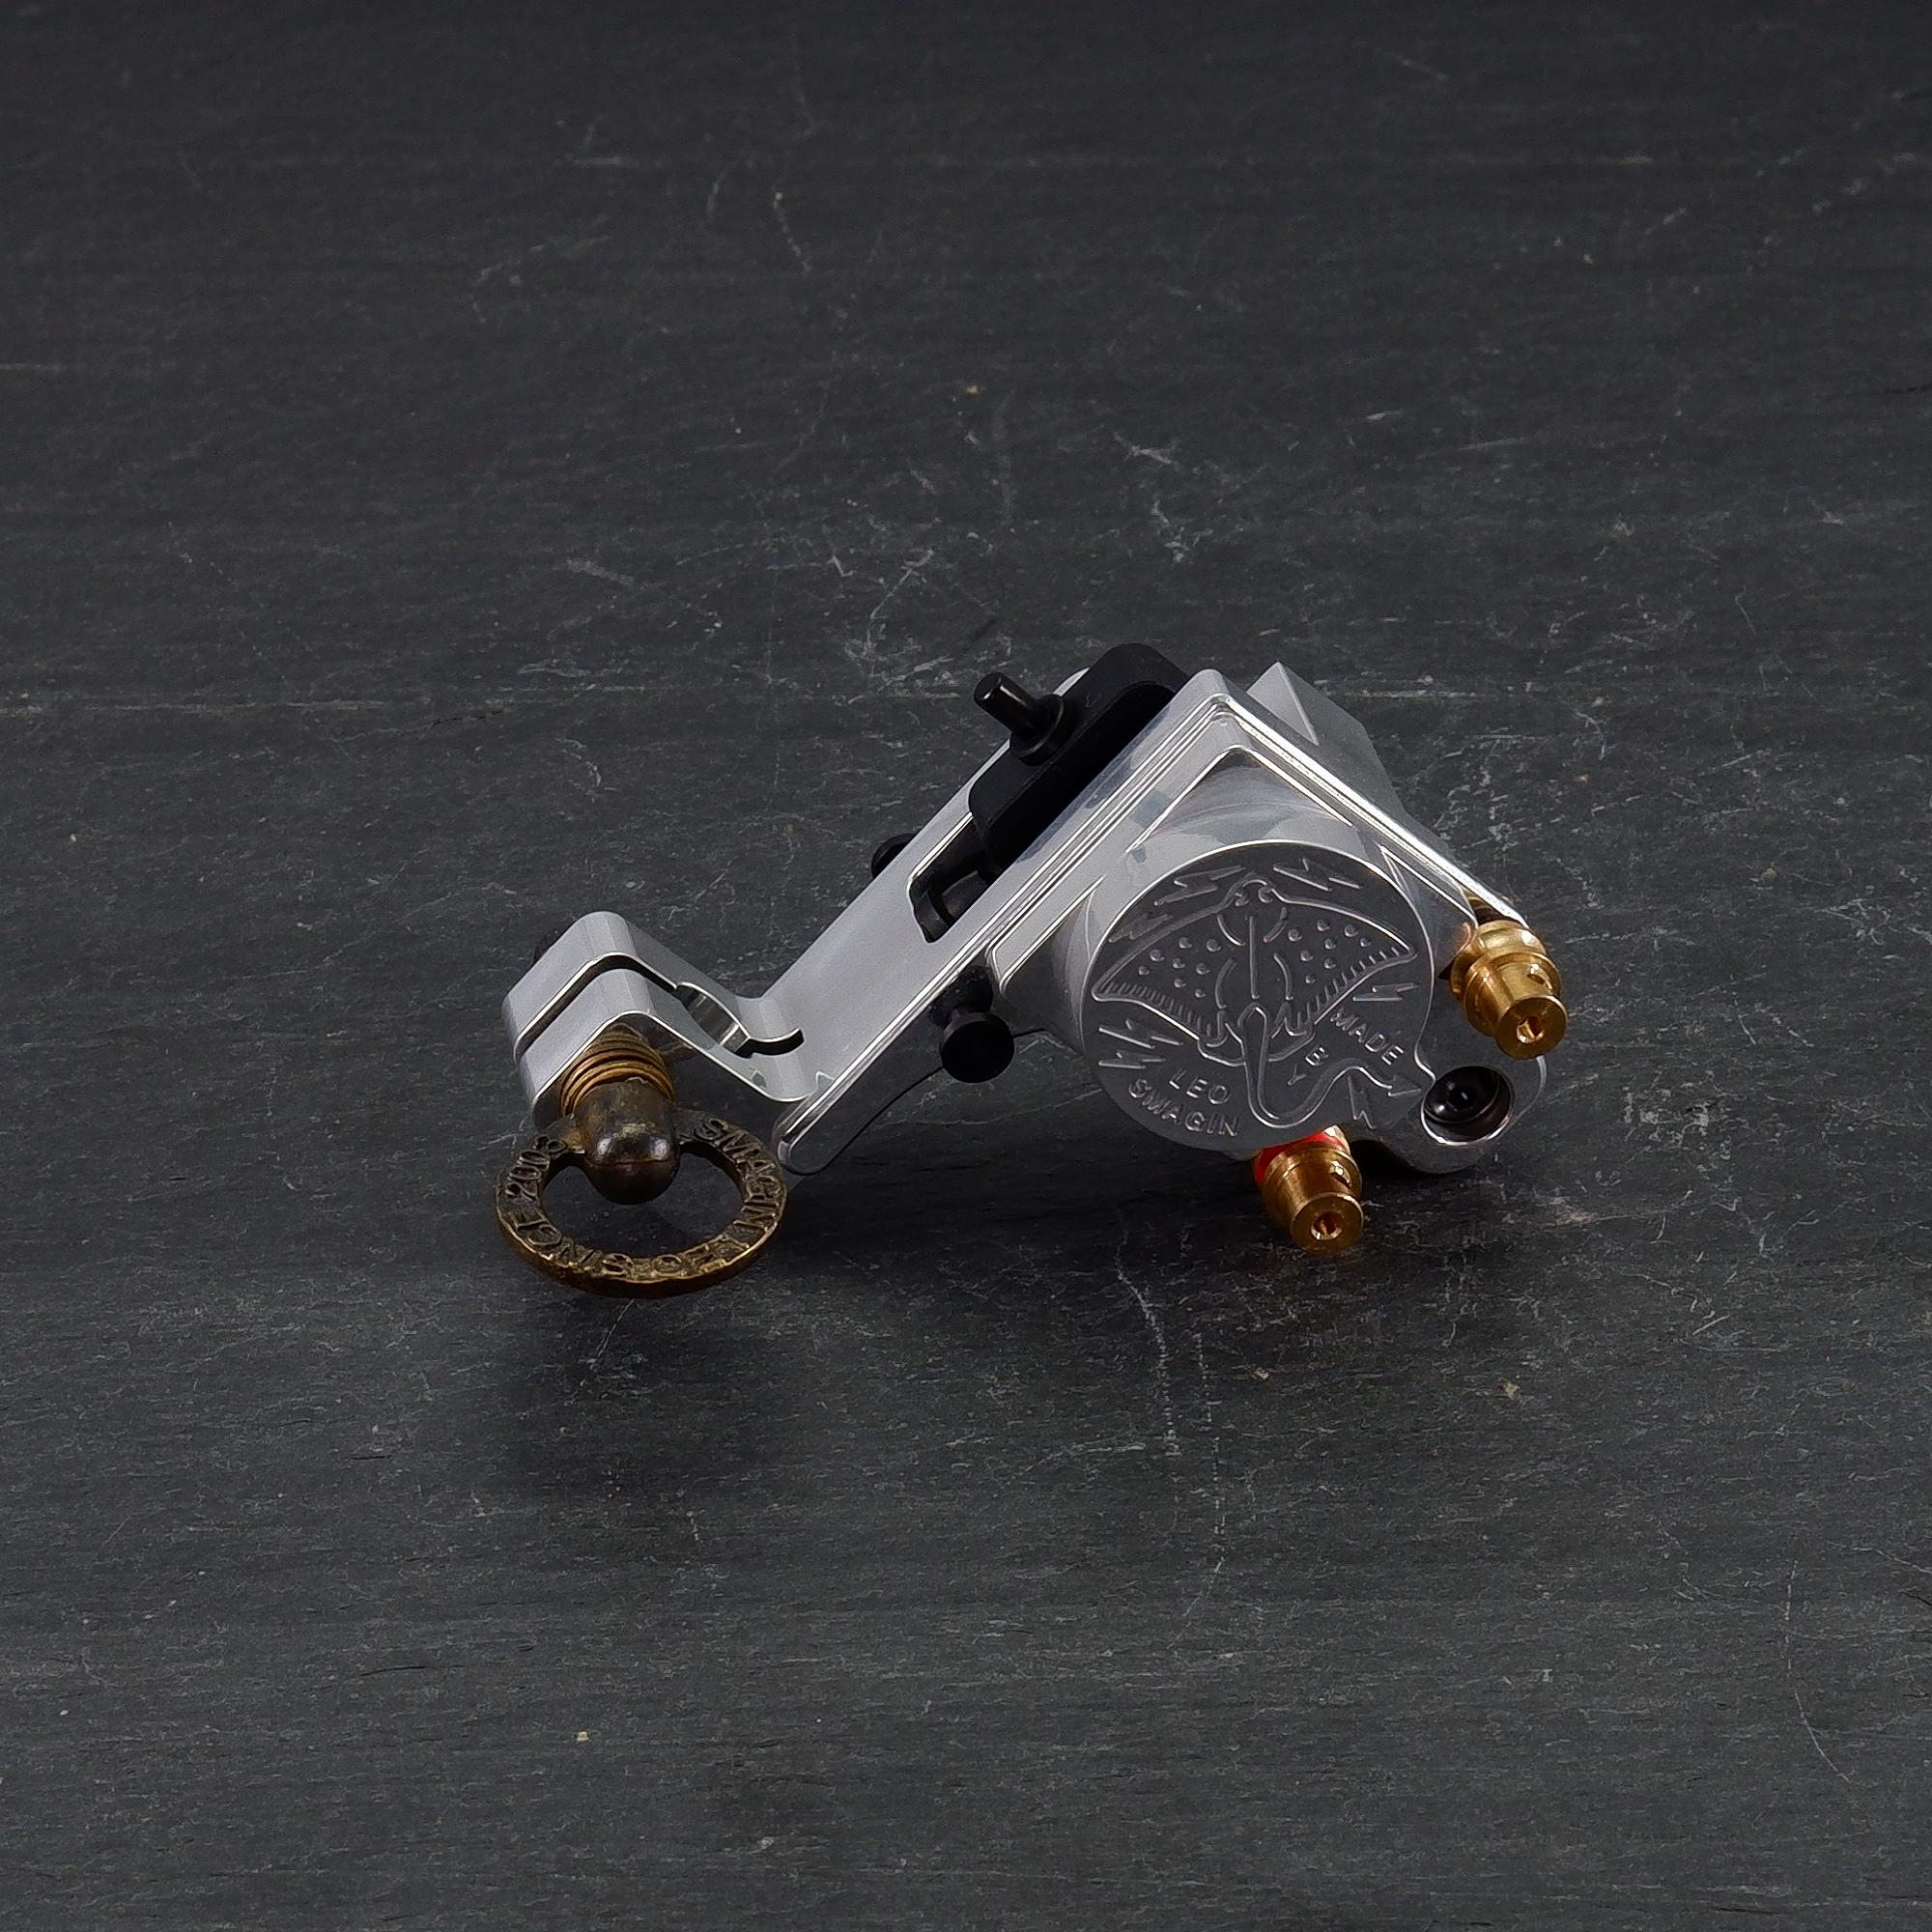 Hybray Silver RCA TattooMachine